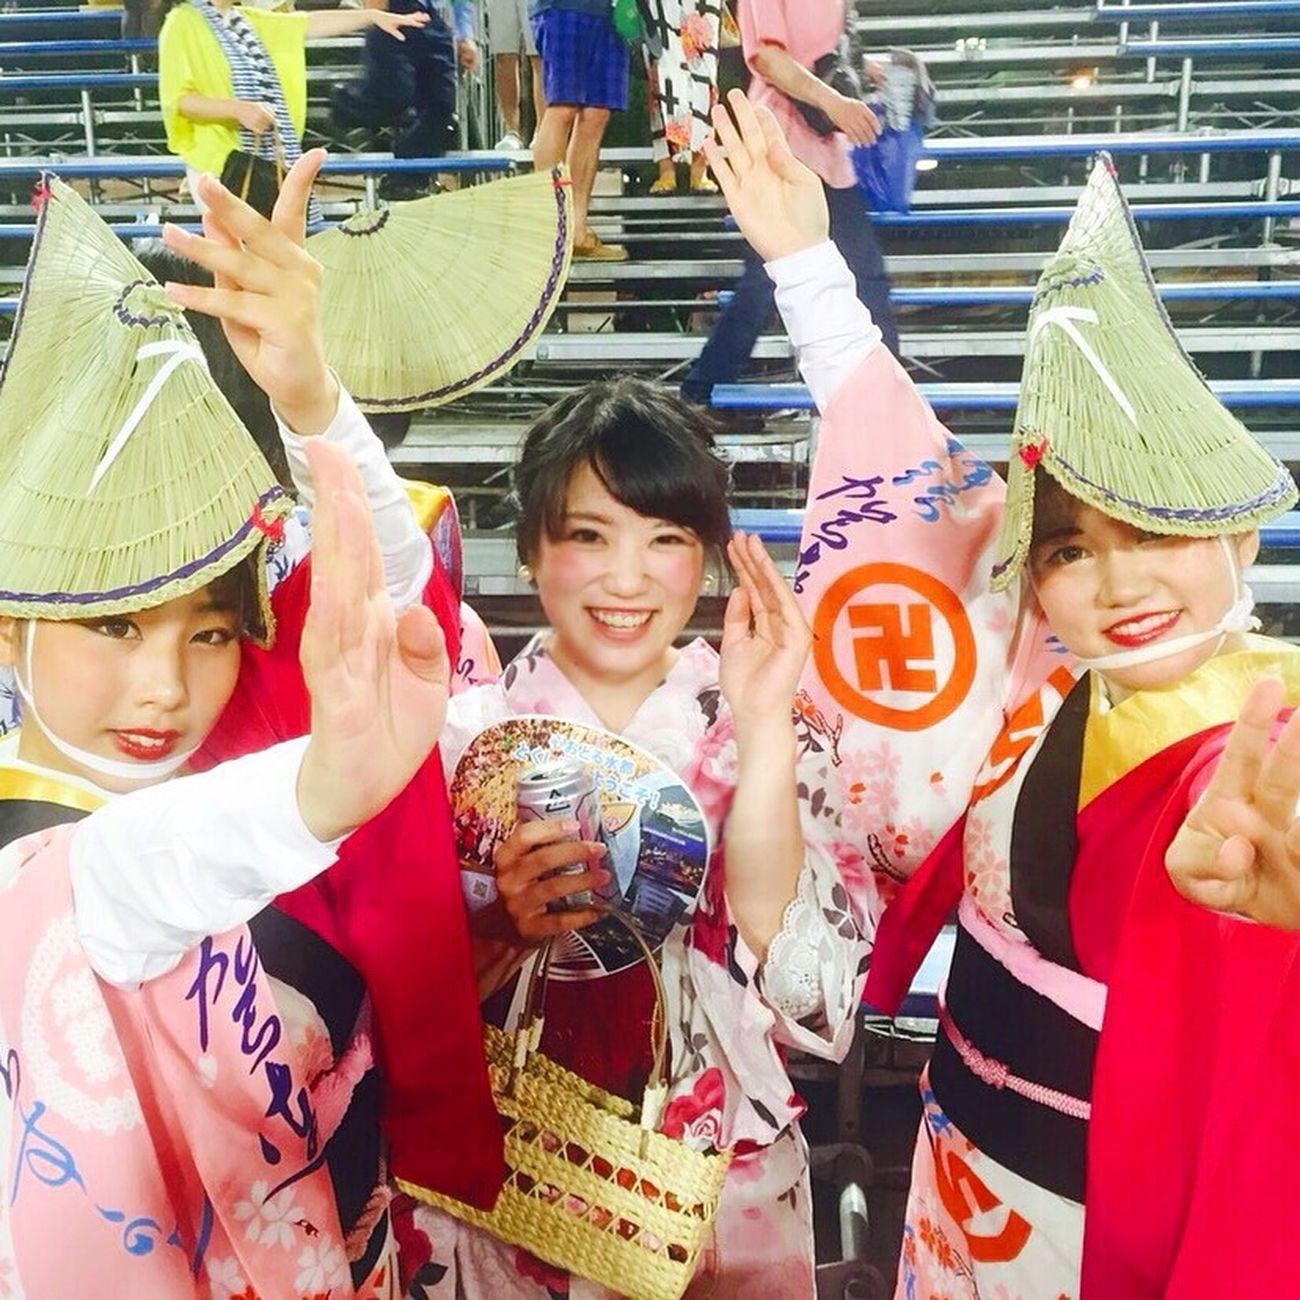 Soooo exiting 💖 Awa dance 2015 お盆 阿波踊り Awadance Tokushima_Japan Dance Japan Culture Summer Exiting Power